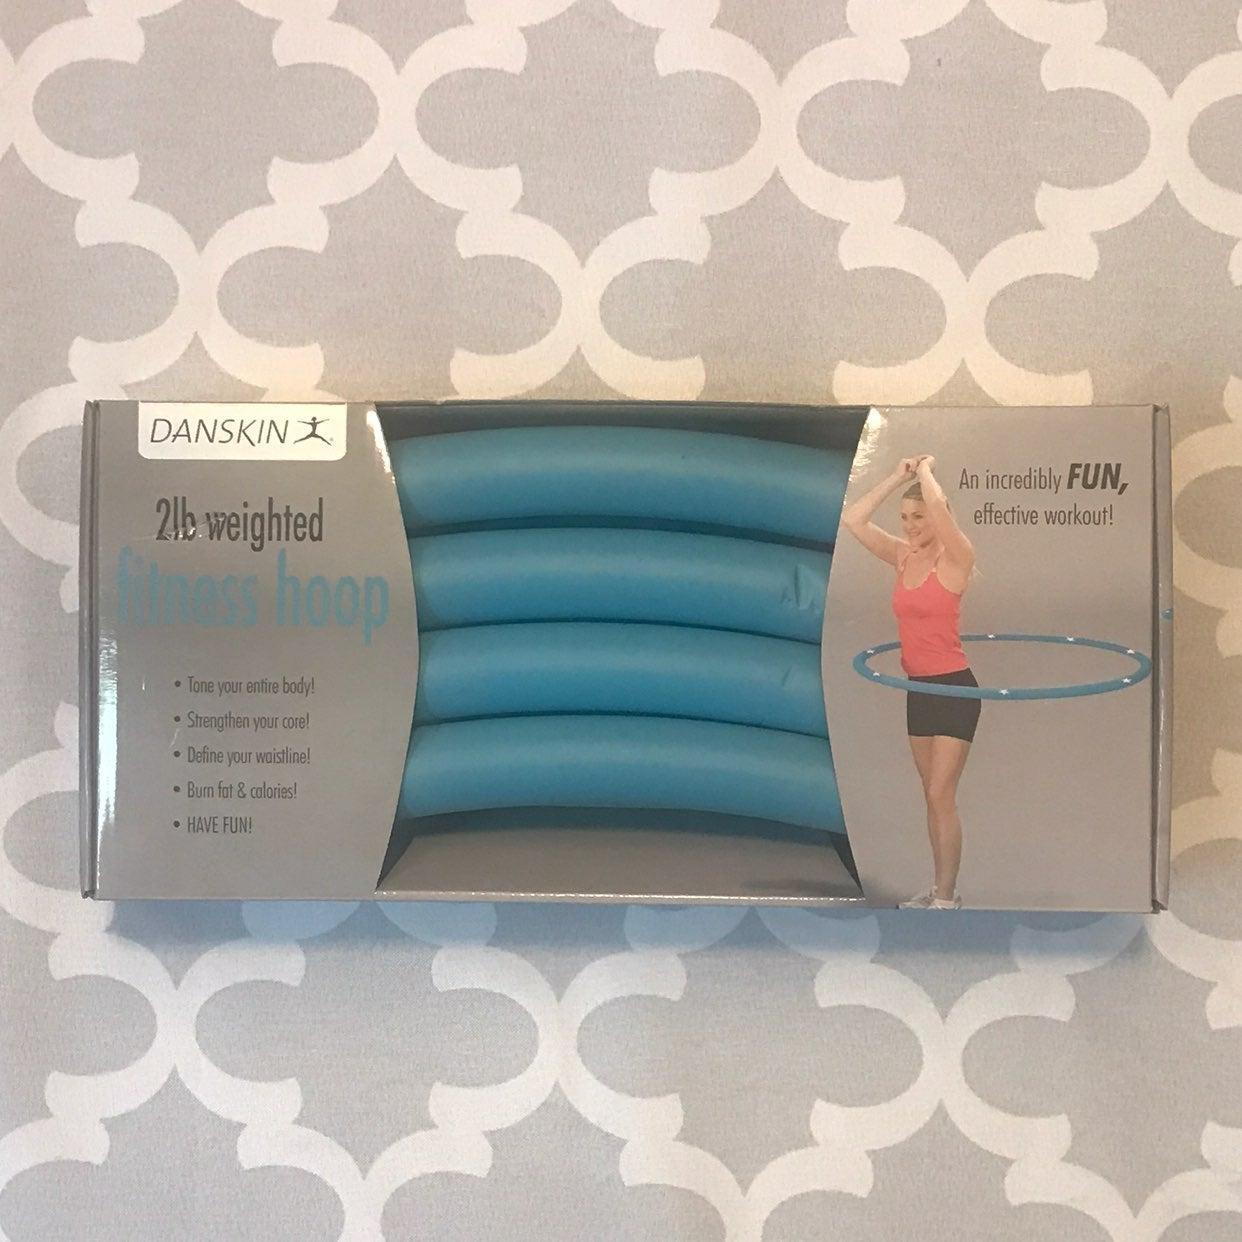 Danskin 2lb Weighted Fitness Hoop